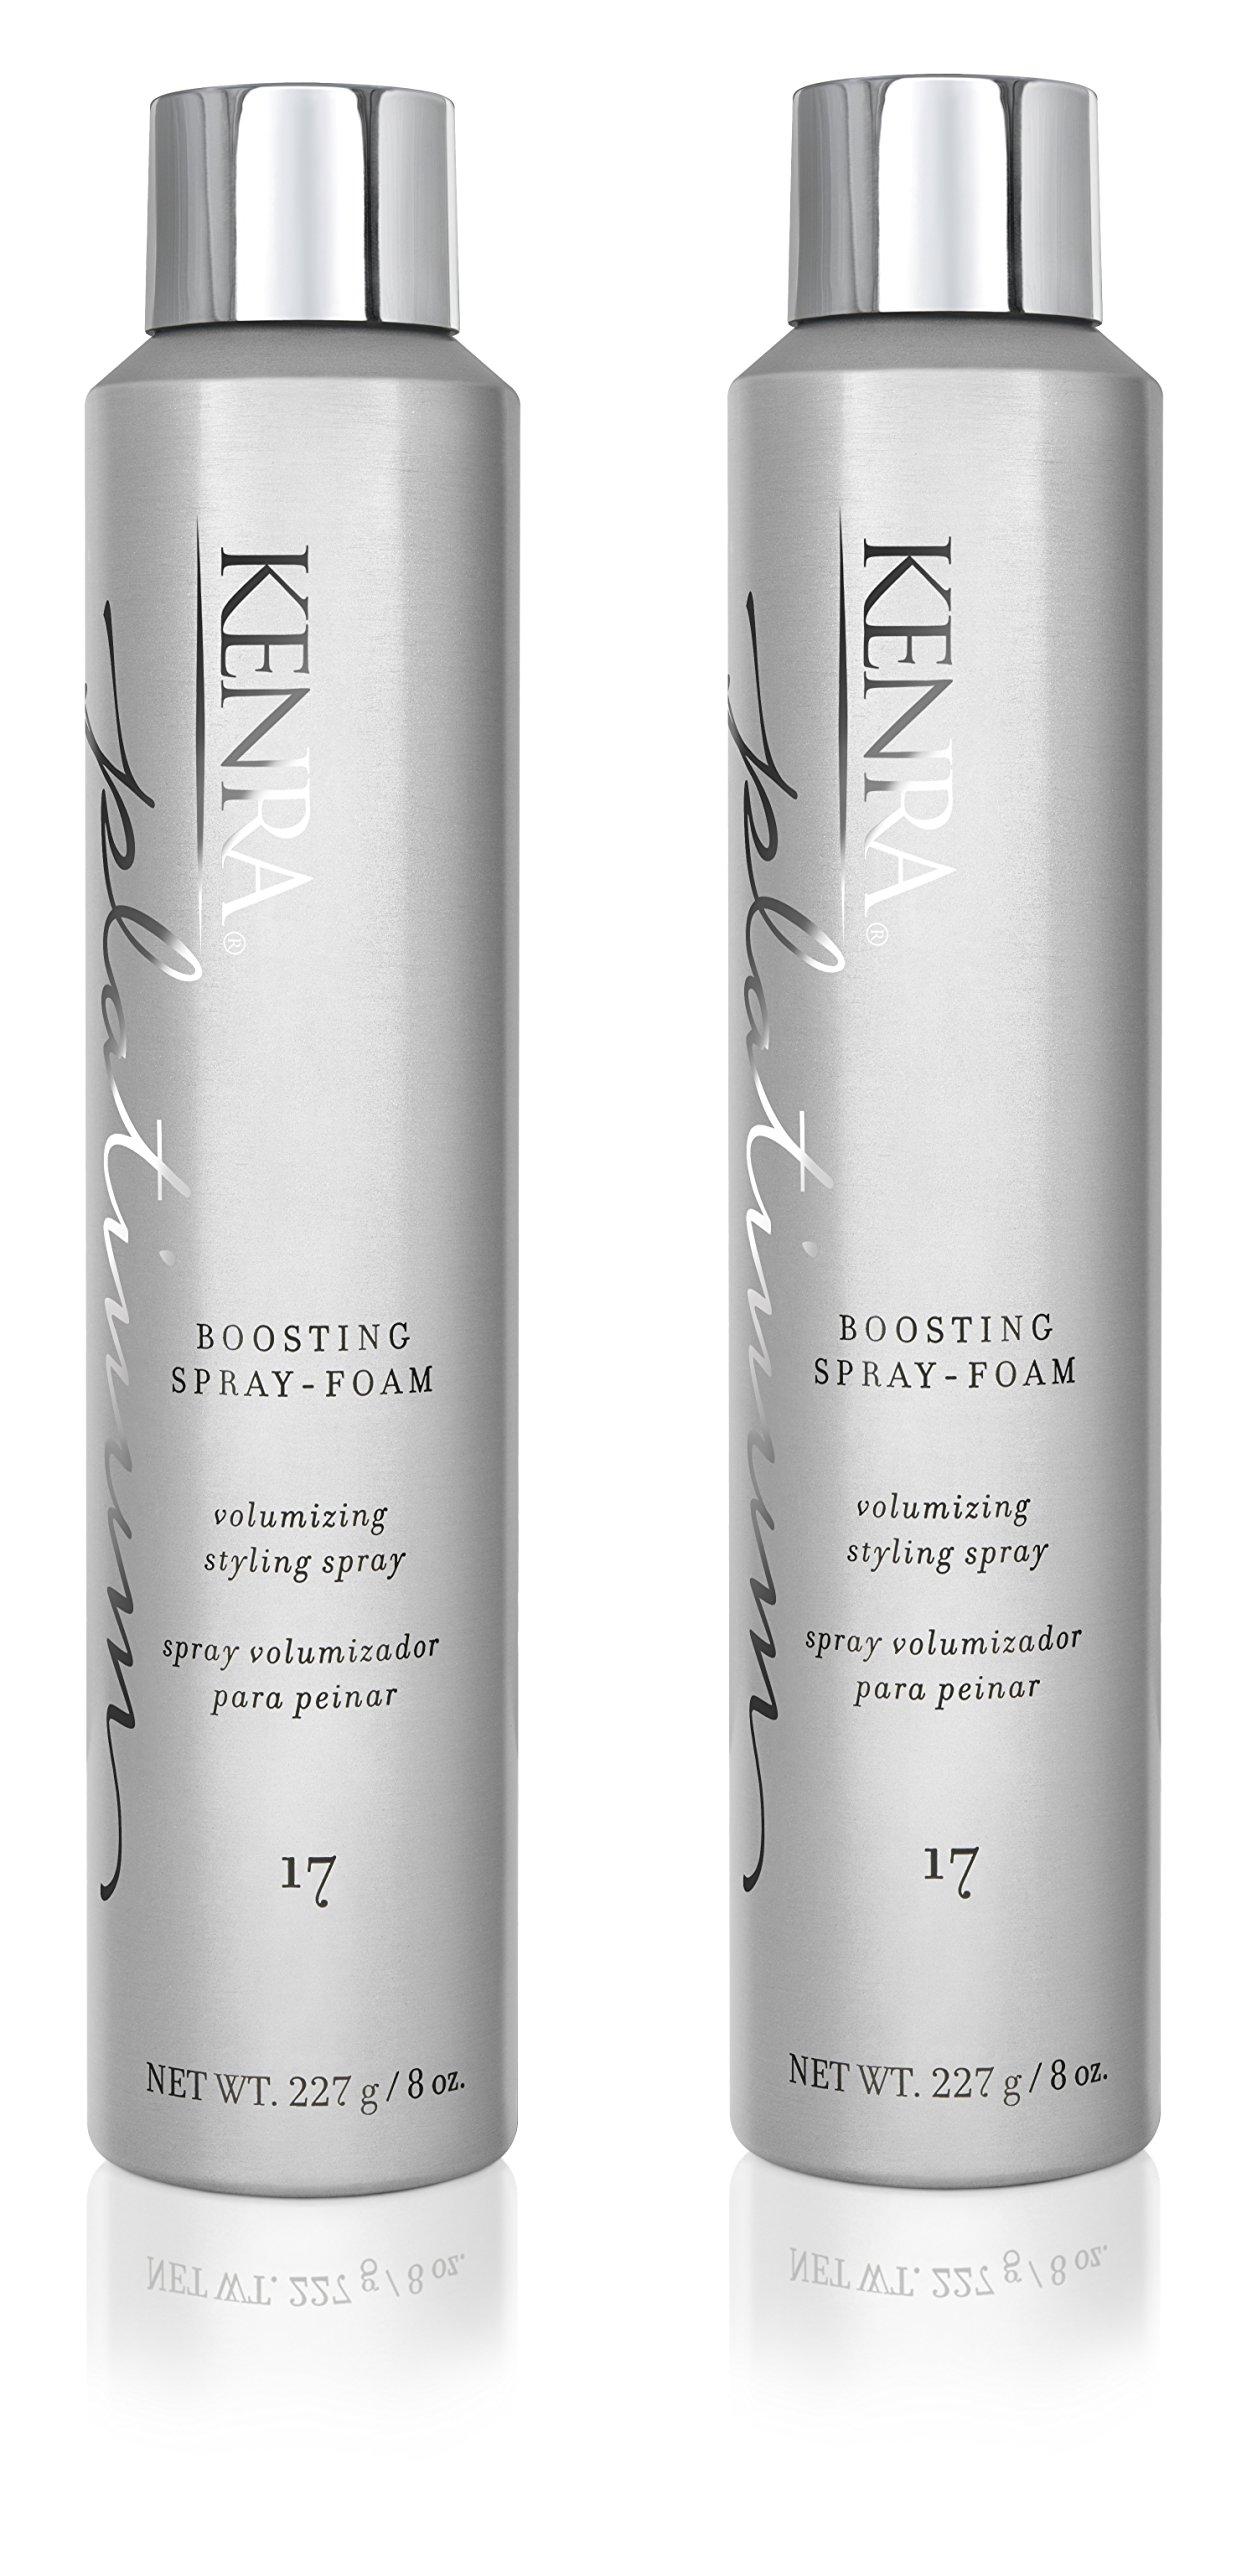 Kenra Platinum Boosting Spray Foam #17, 8-Ounce (2-Pack) by Kenra